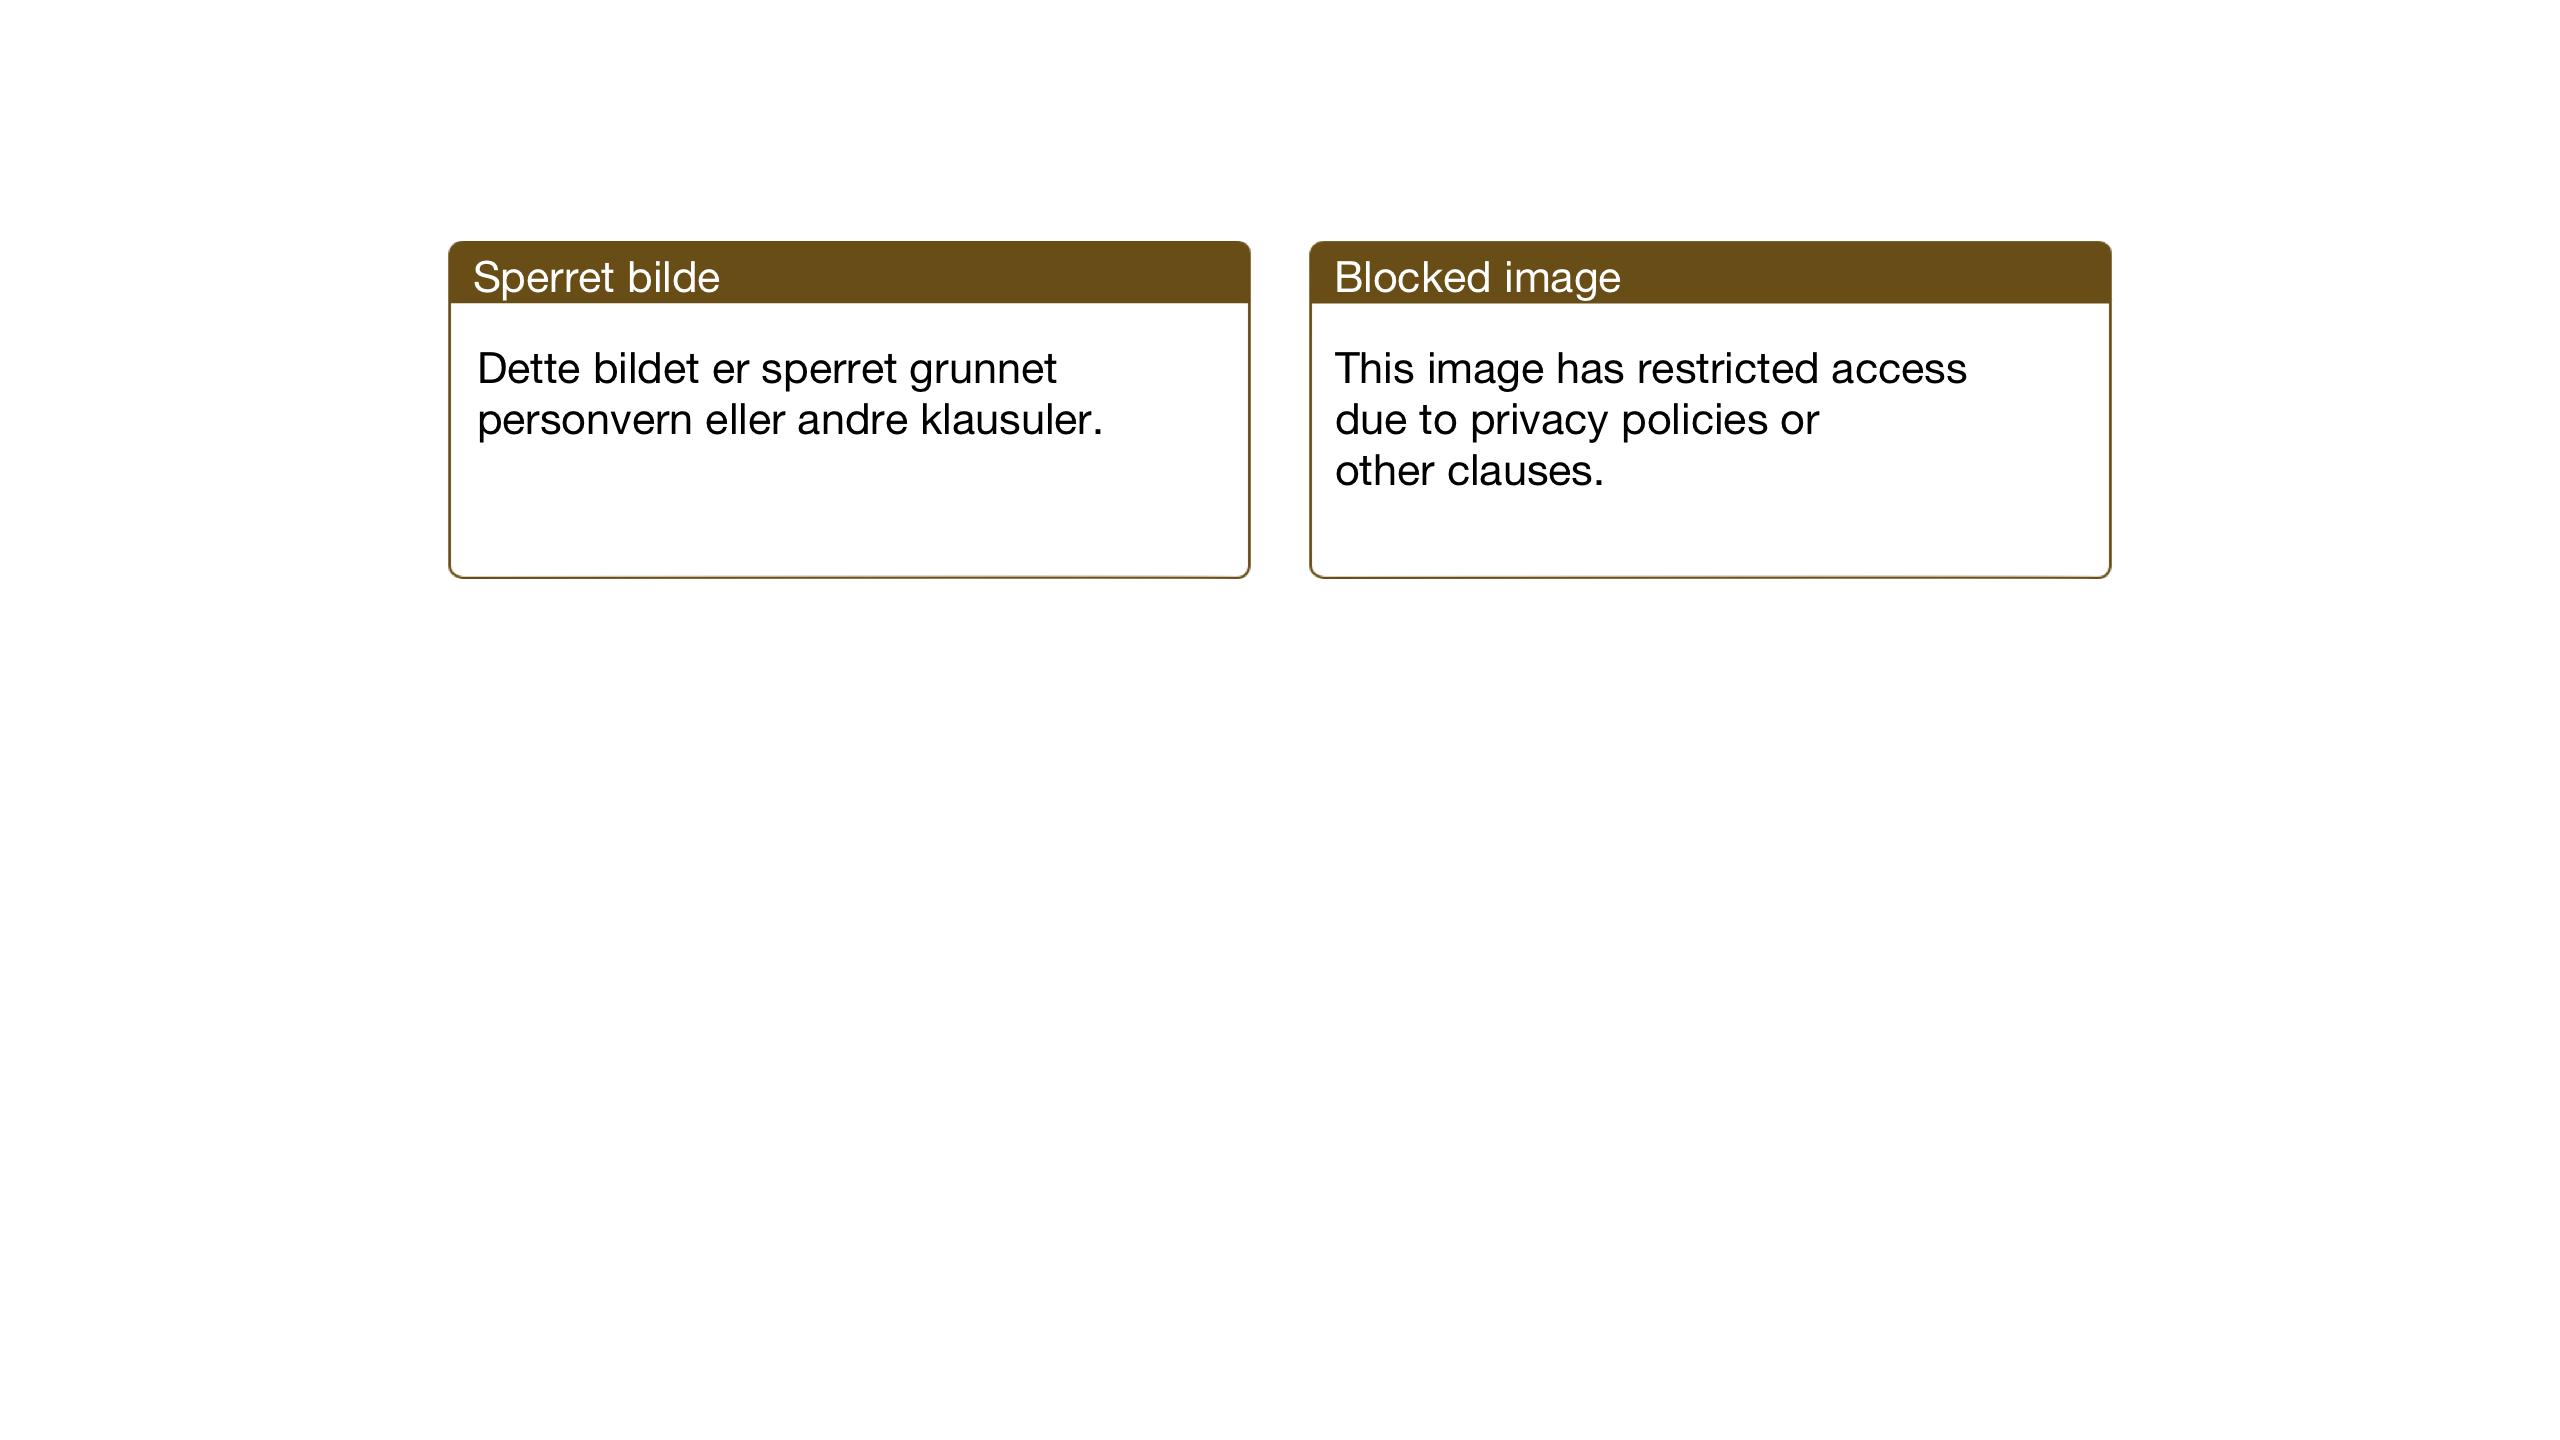 SAB, Domkirken Sokneprestembete, H/Haa: Ministerialbok nr. C 9, 1958-2001, s. 111b-112a